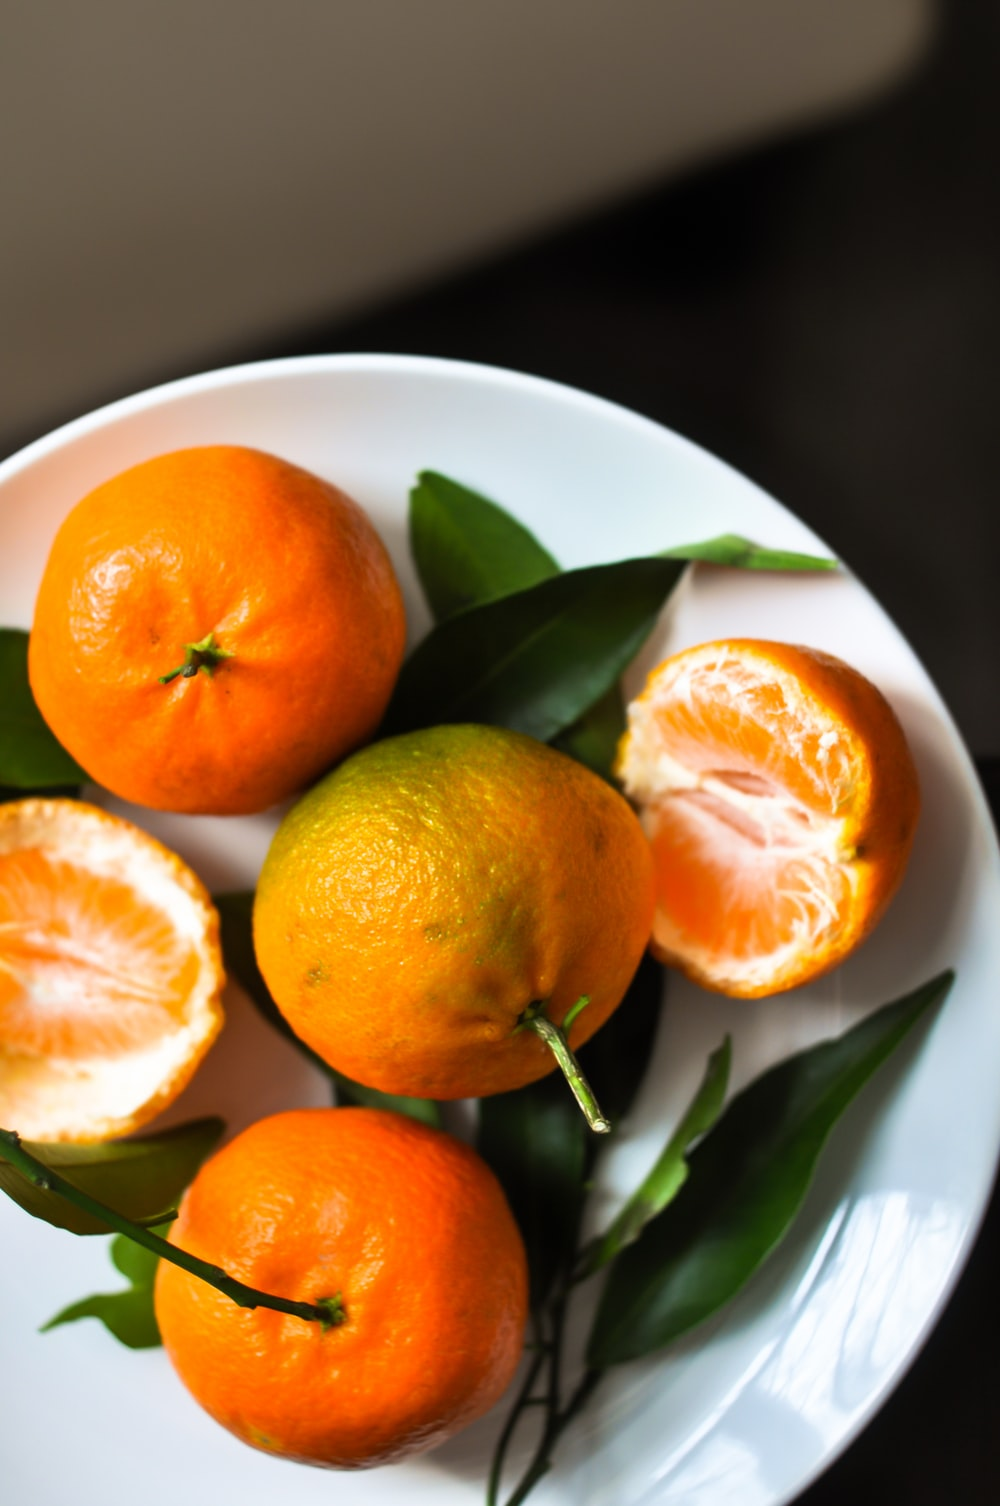 orange fruits on plate